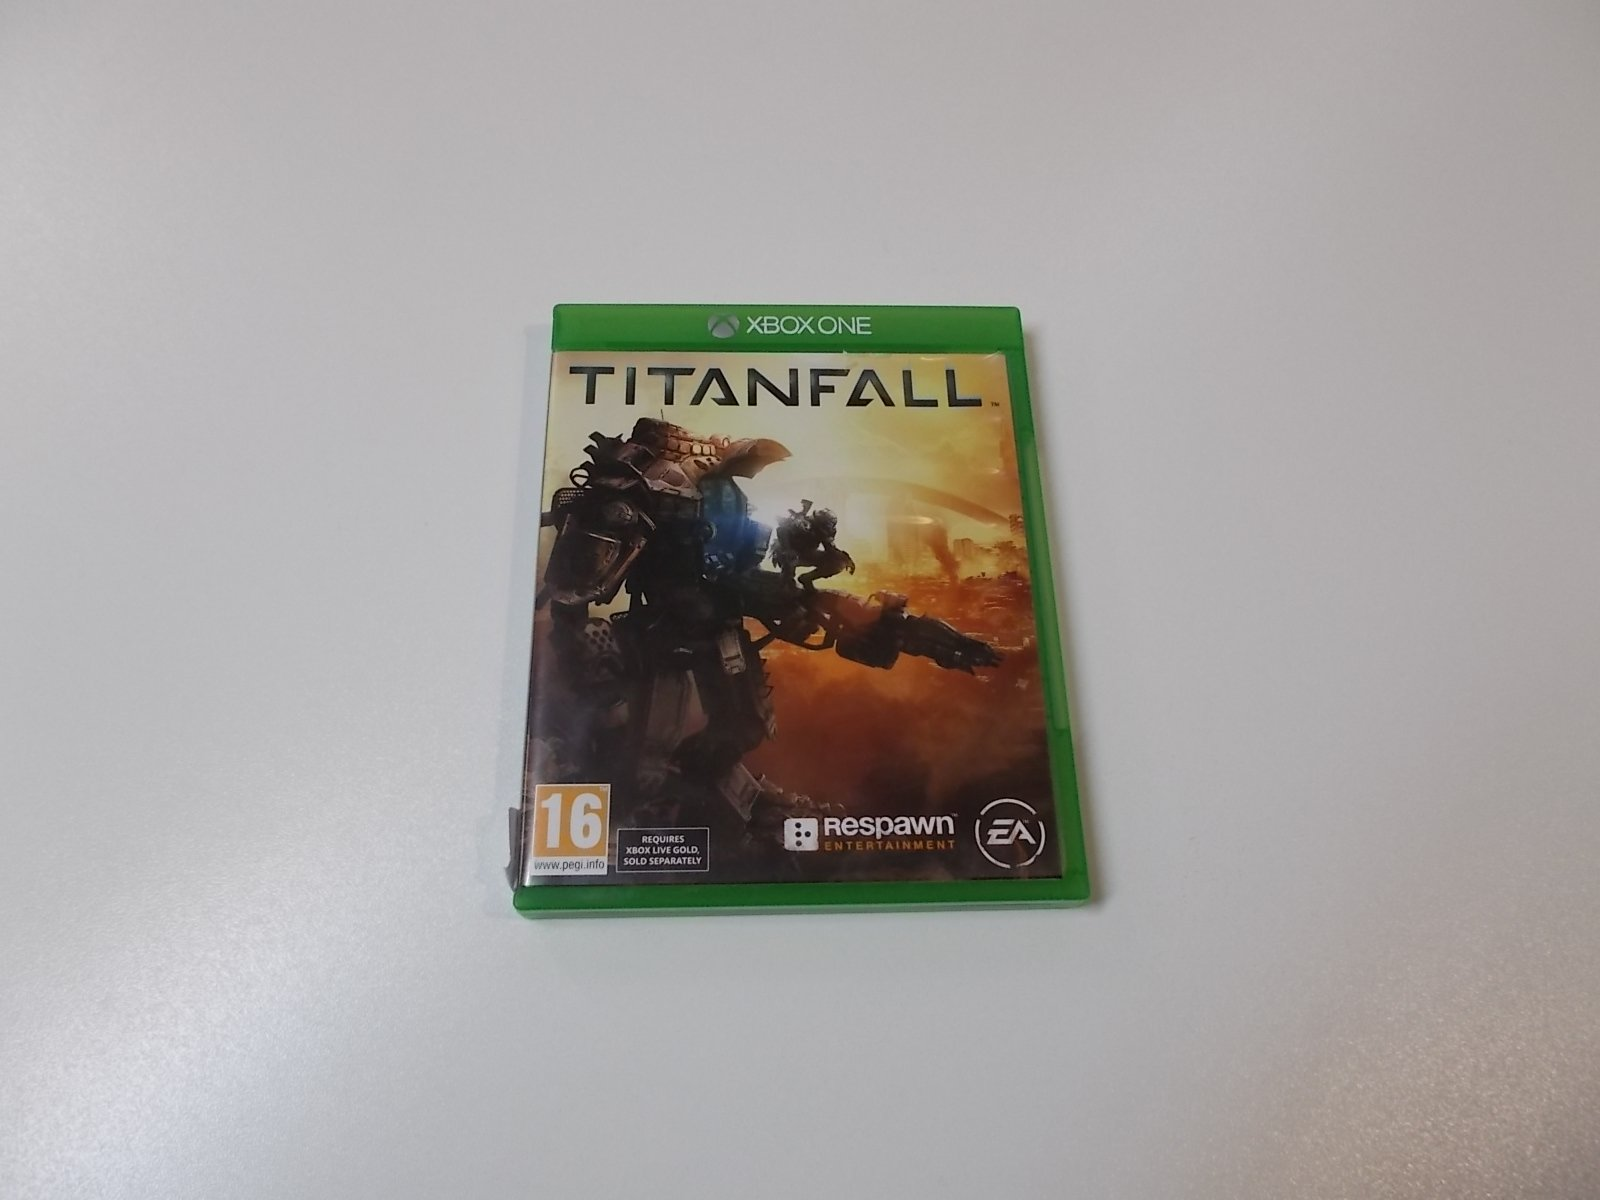 Titanfall - GRA Xbox One - Opole 0463